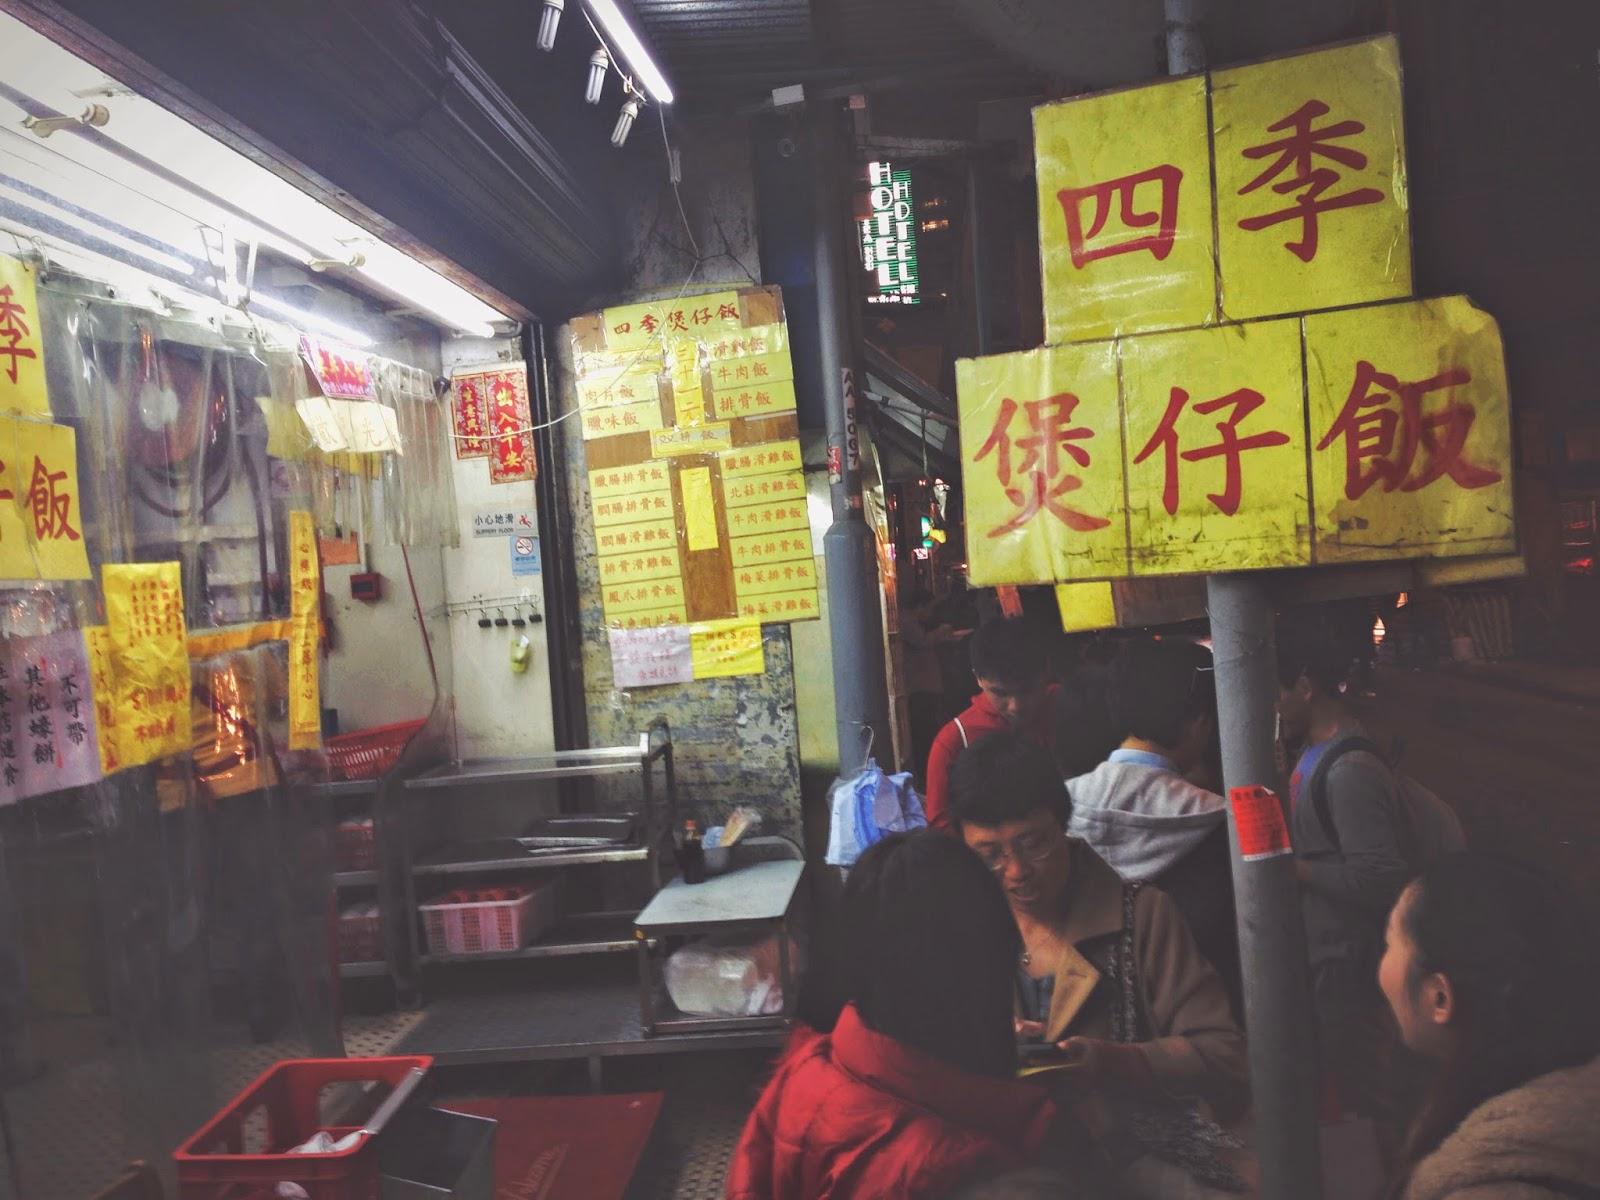 Four Seasons Claypot Rice Temple St Yau Ma Tei Hong Kong